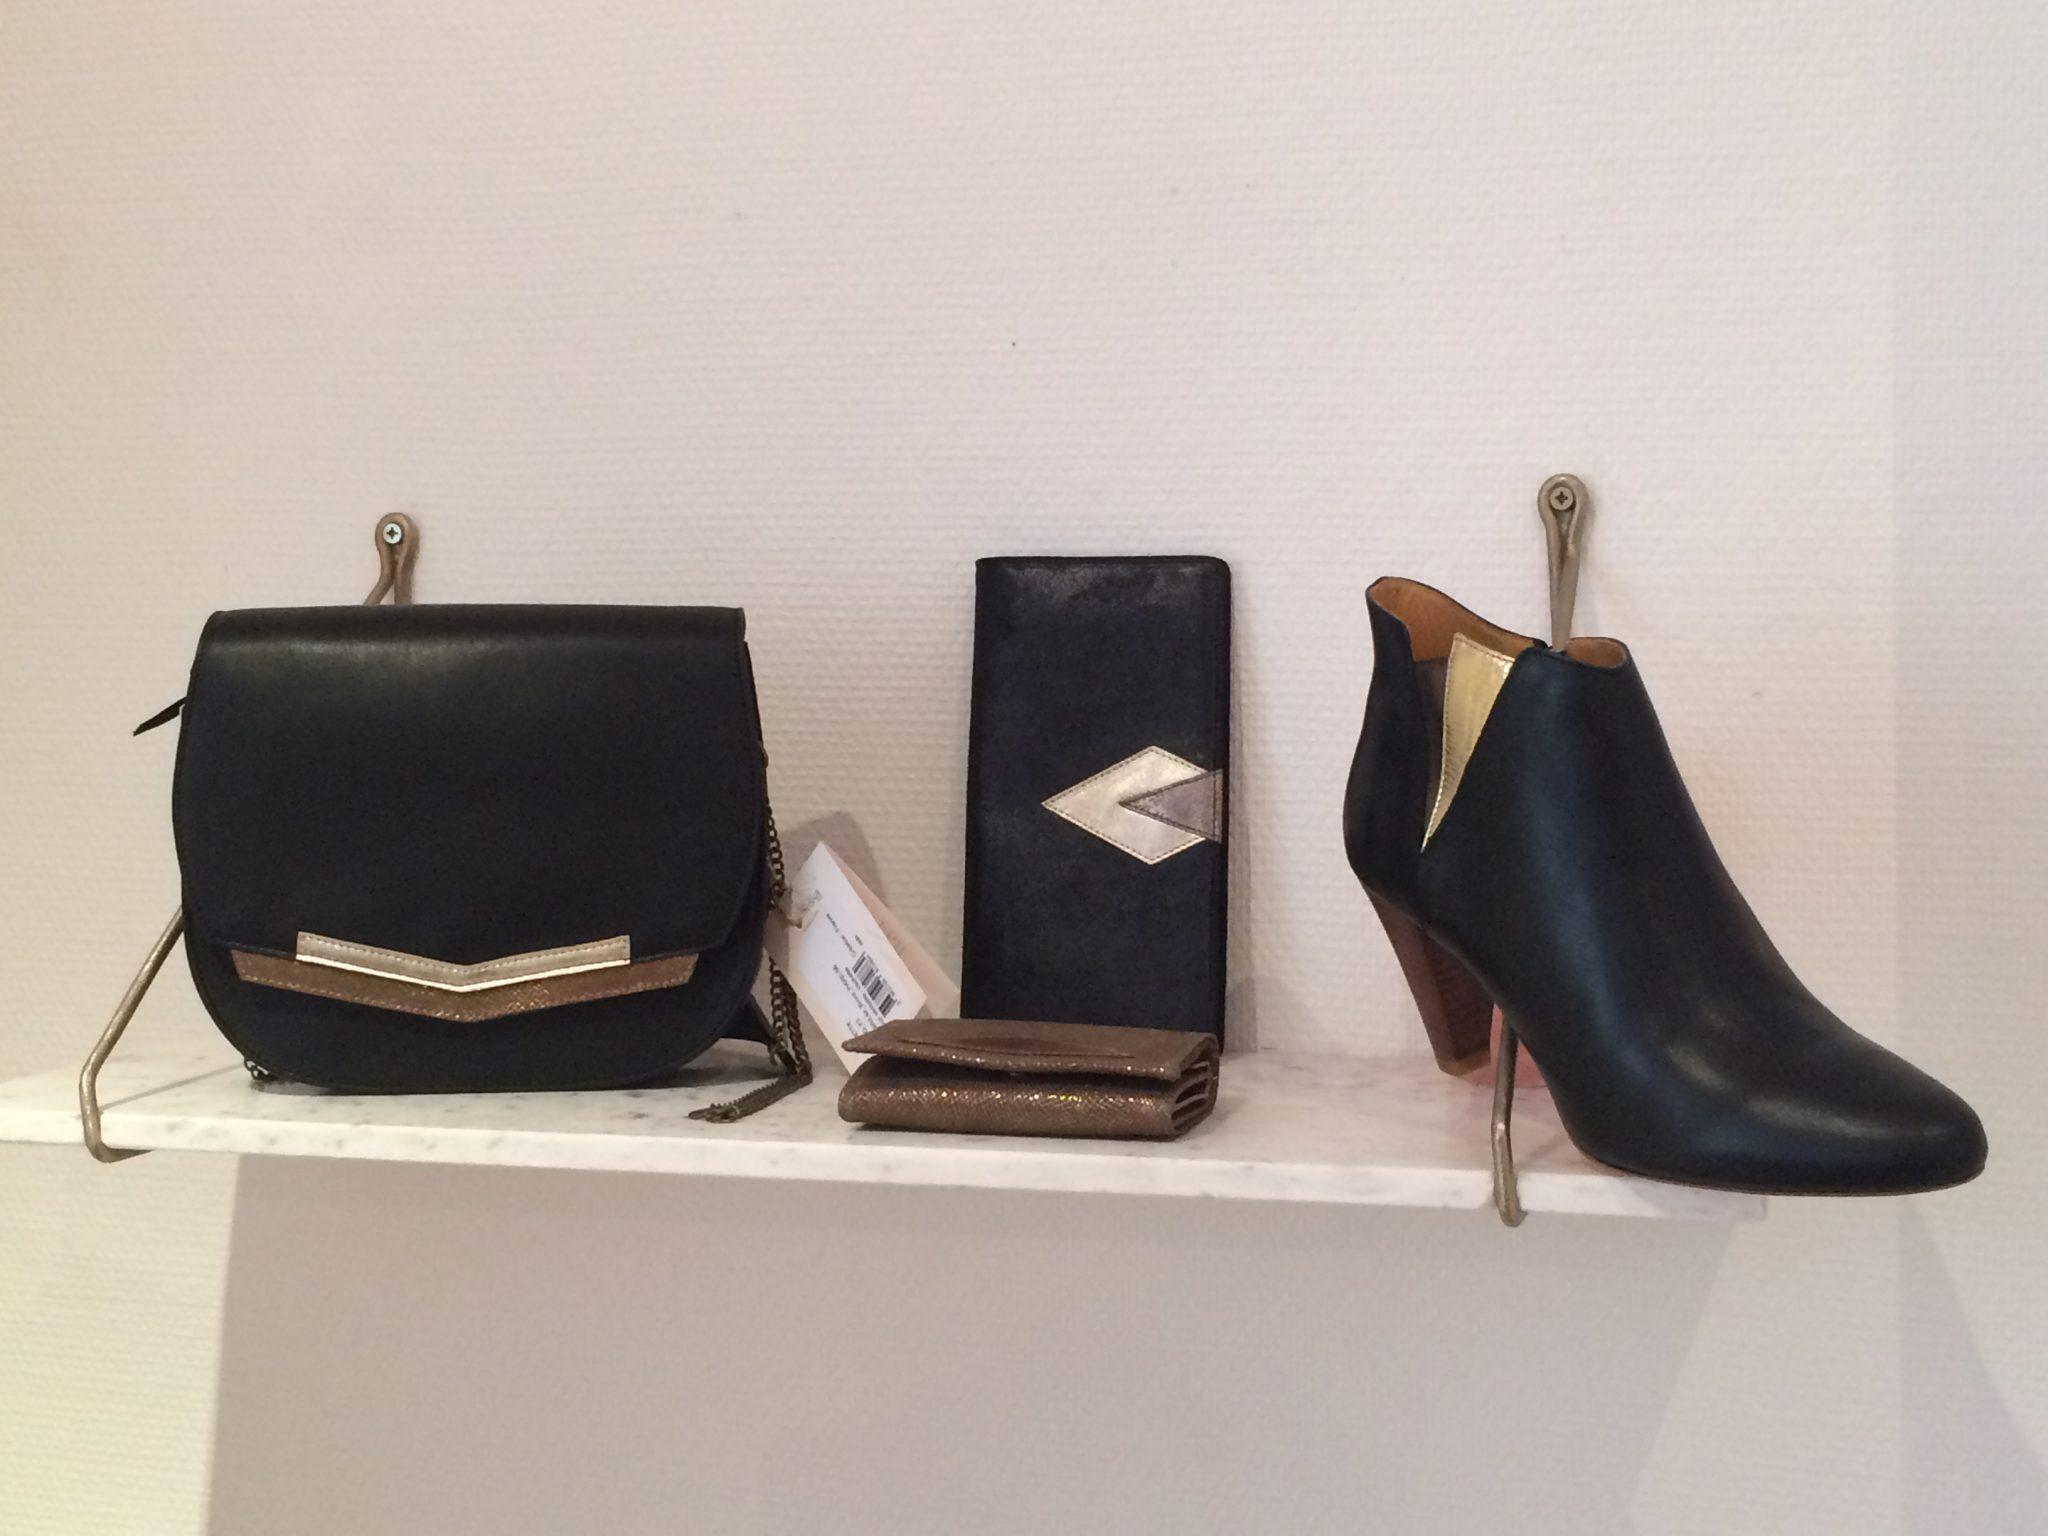 la collection Antoinette Ameska